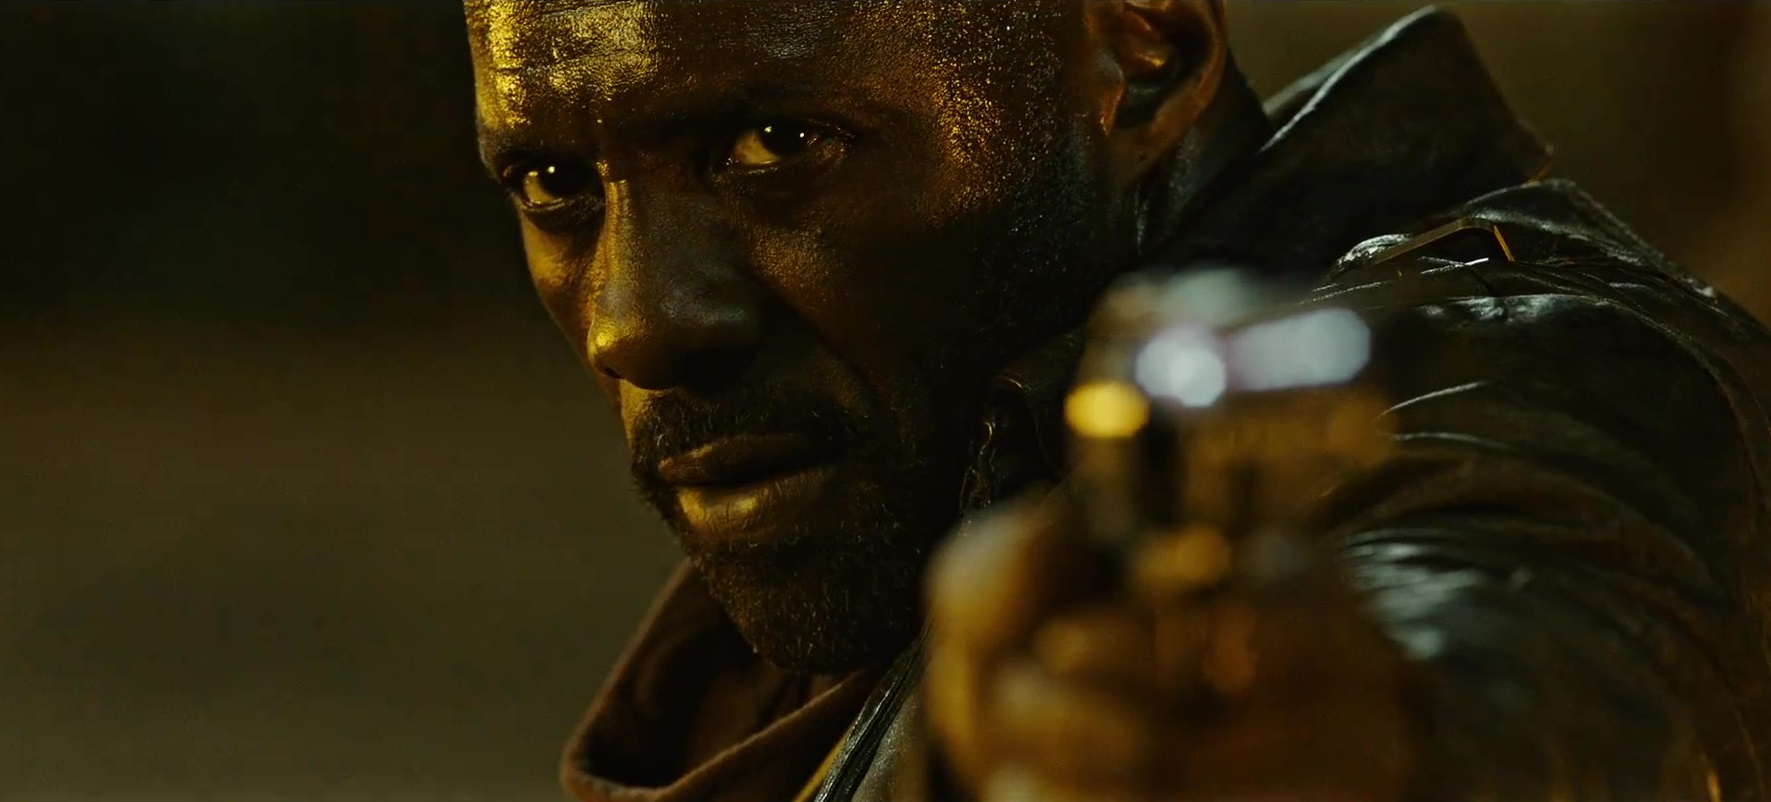 Idris Elba The Drk Tower